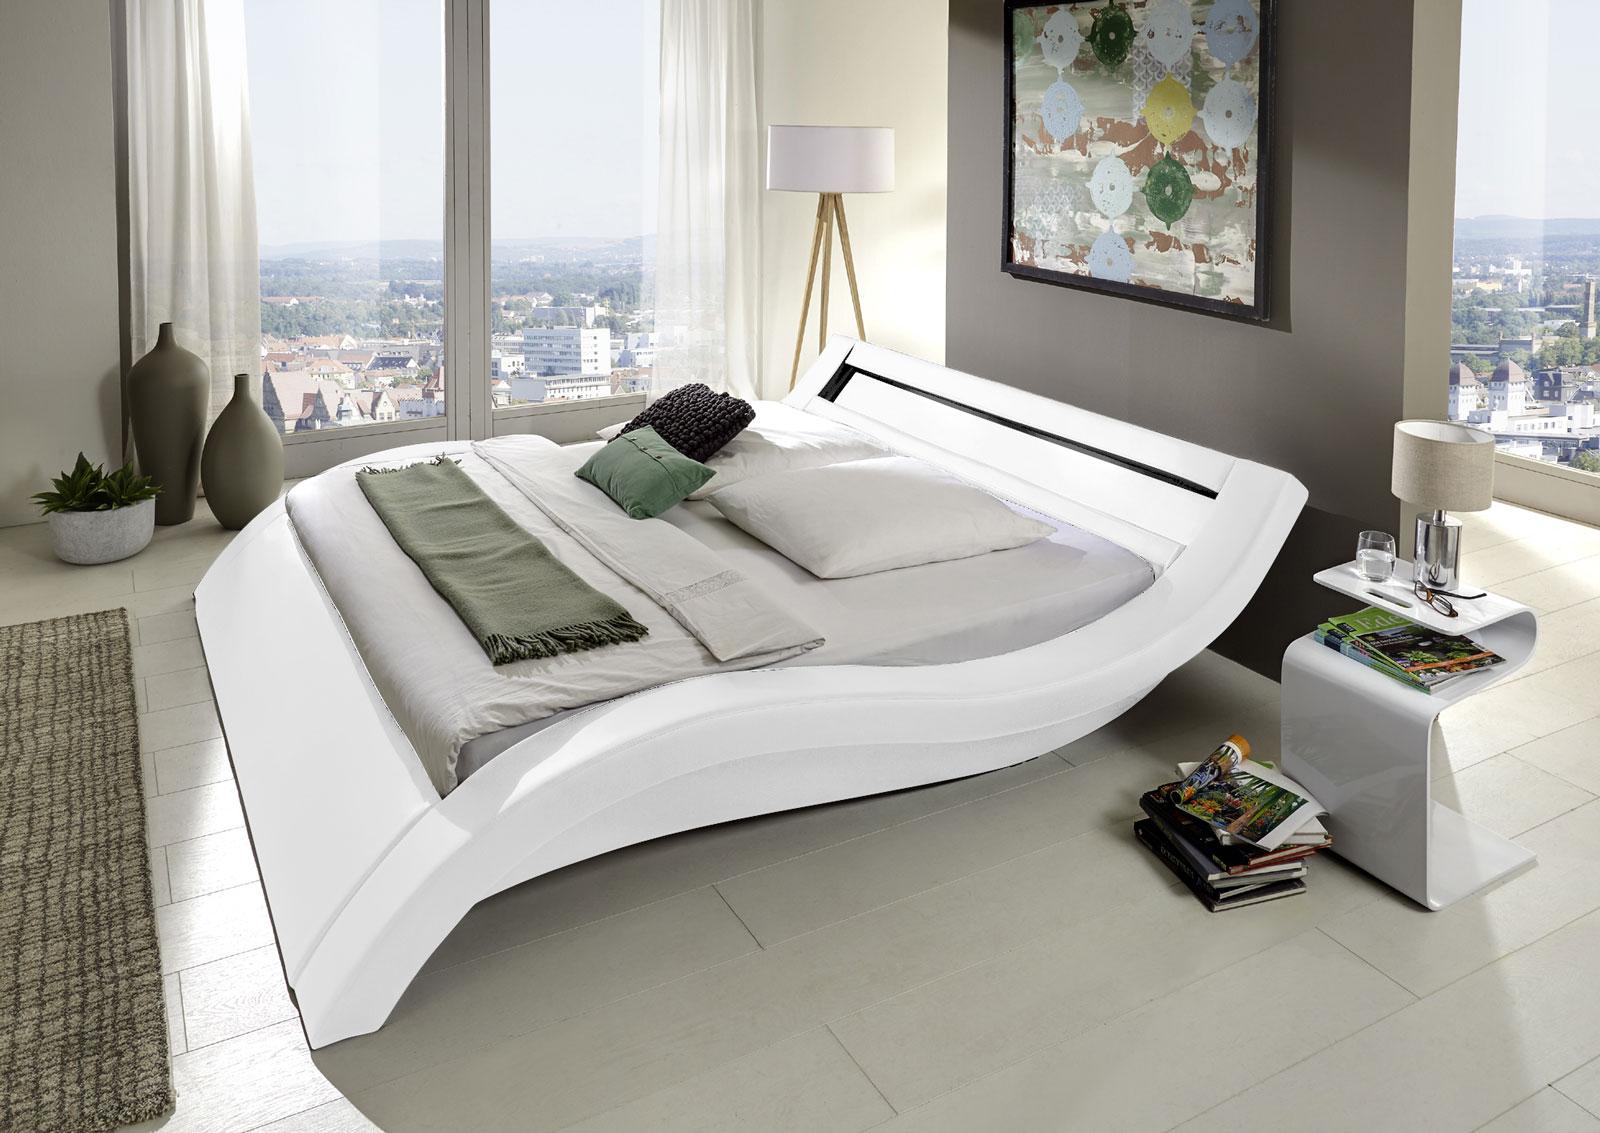 sam design bett 120 x 200 cm led wei look auf lager. Black Bedroom Furniture Sets. Home Design Ideas